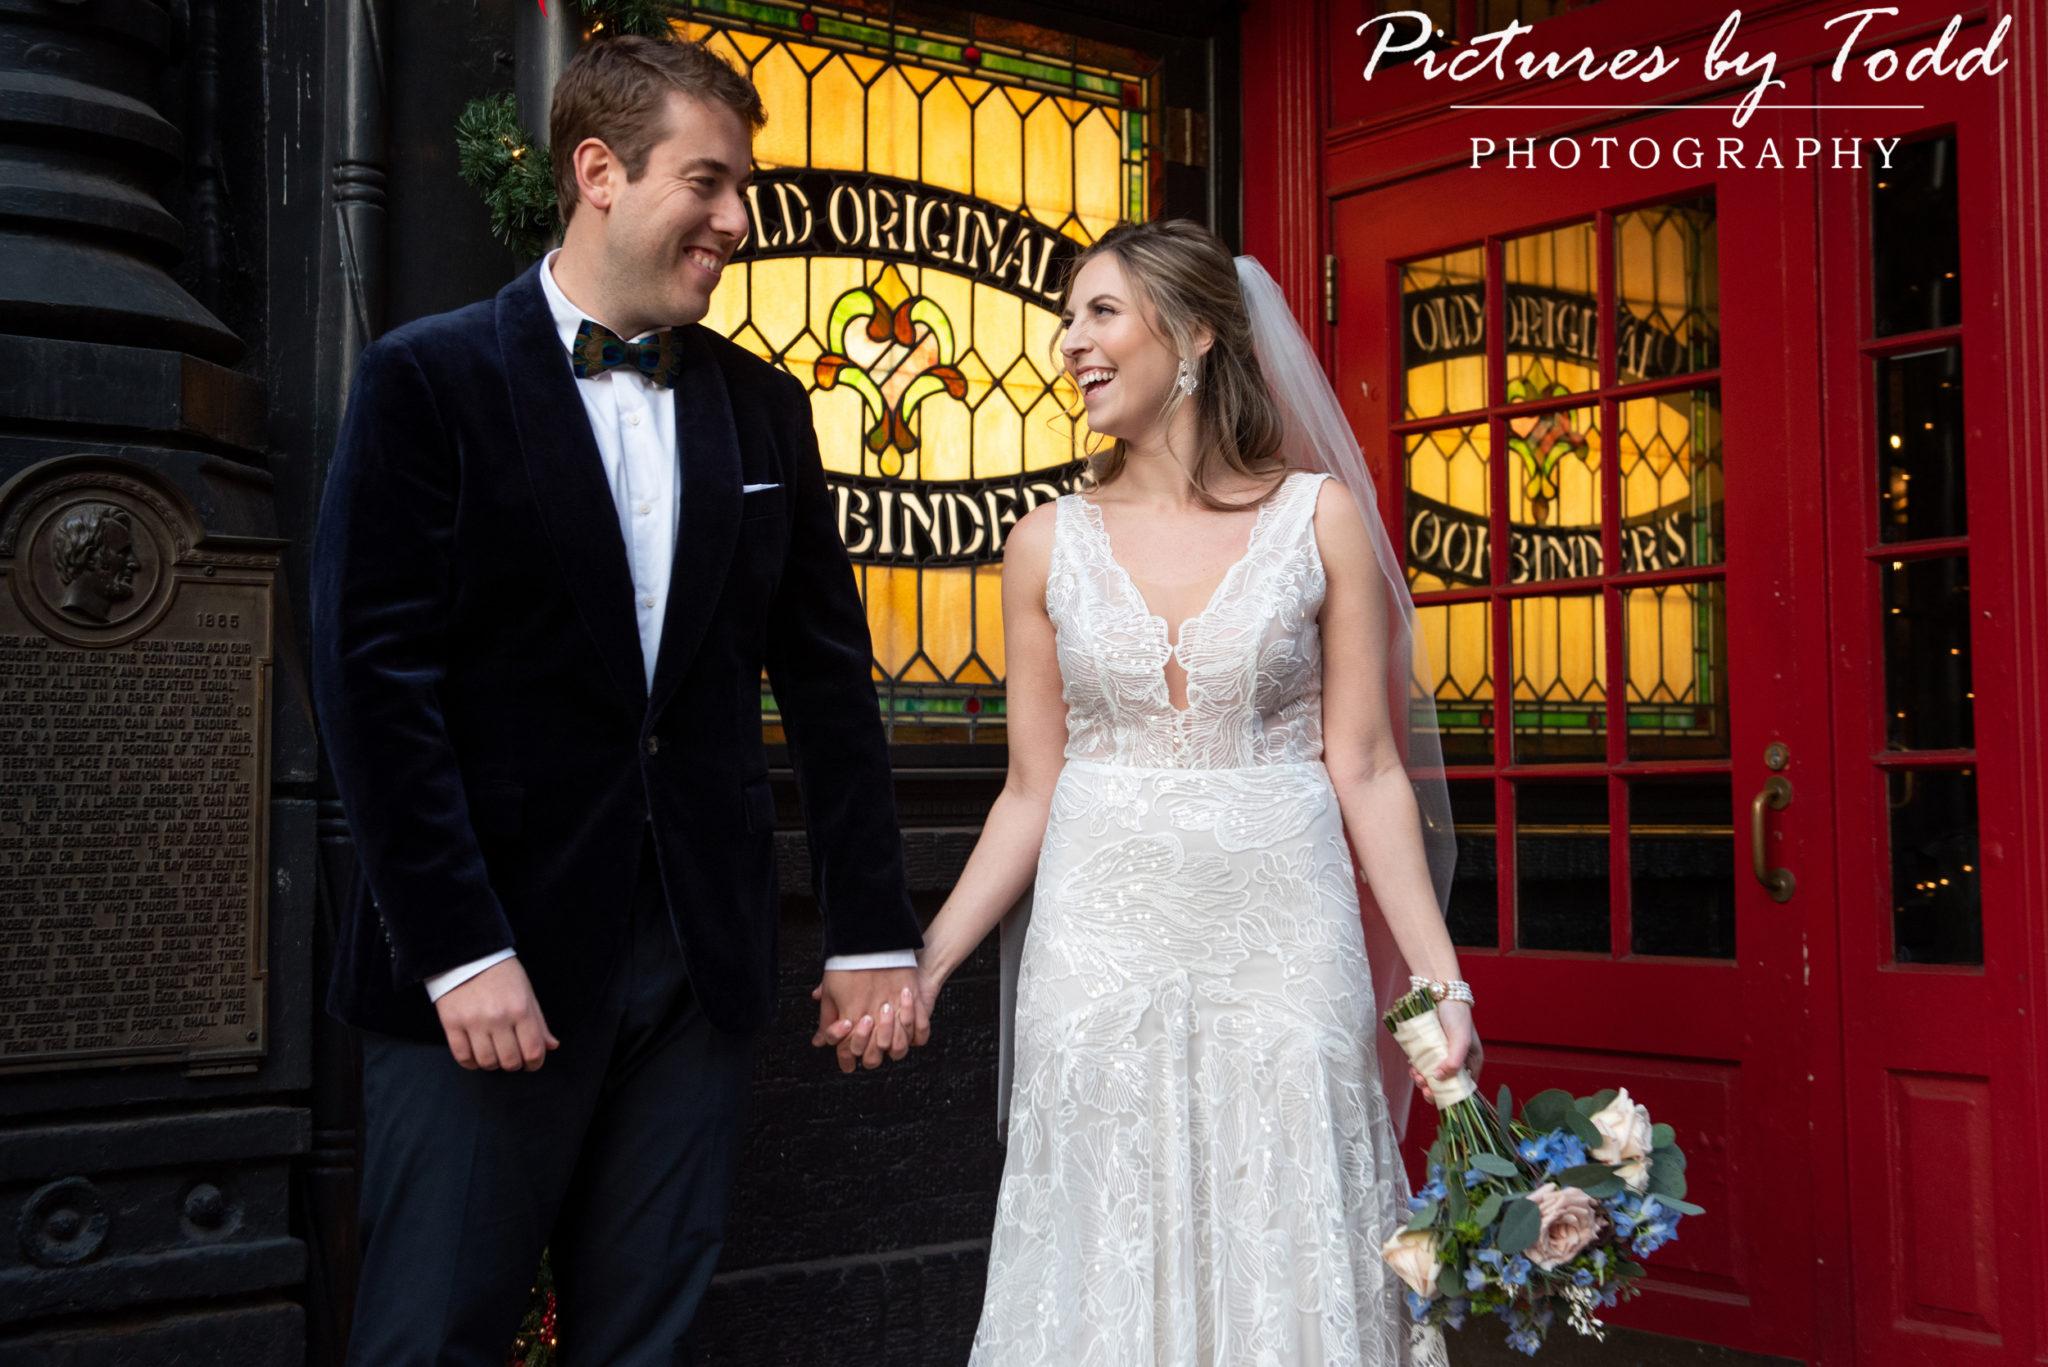 Abby & Louie's Wedding | Historic Olde Bar in Philadelphia